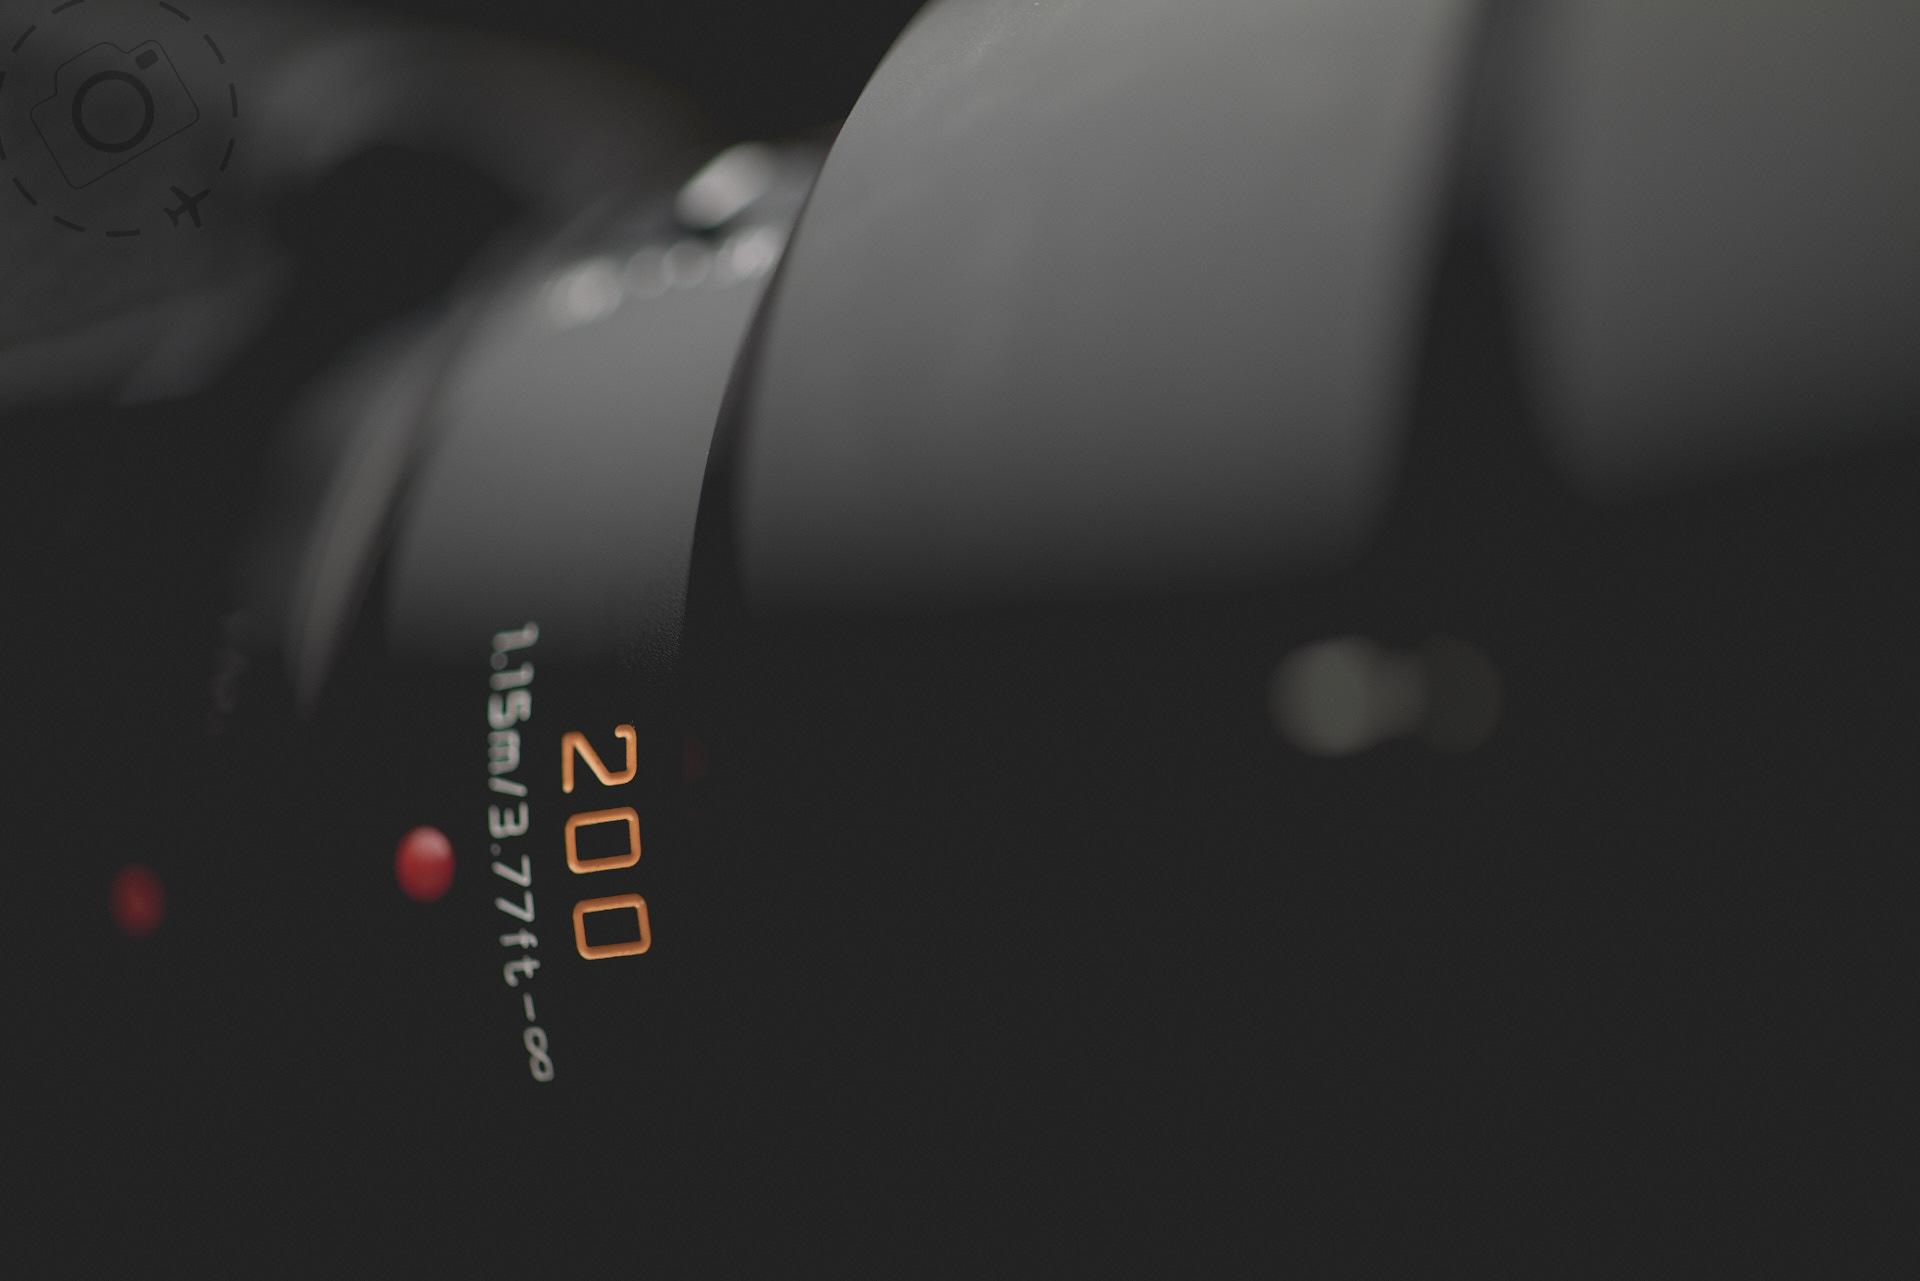 My Other Birding Lens